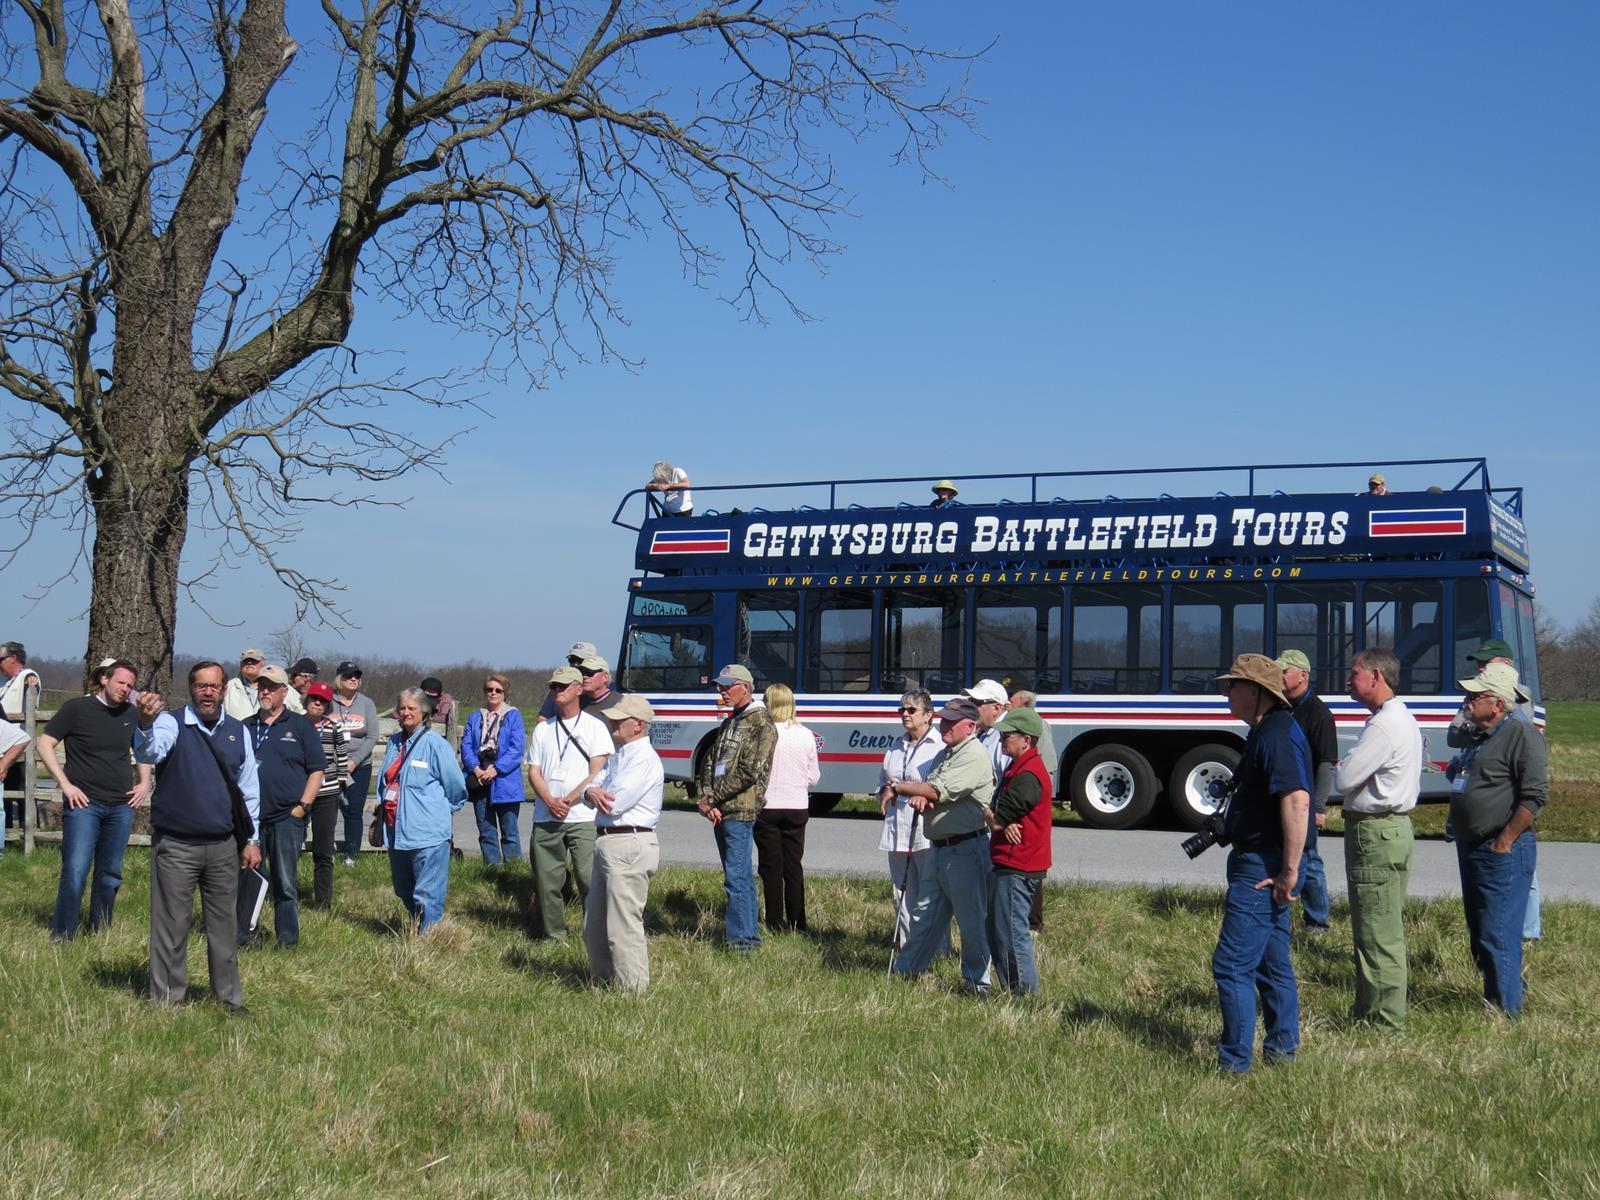 Double Decker Bus Tour Gettysburg